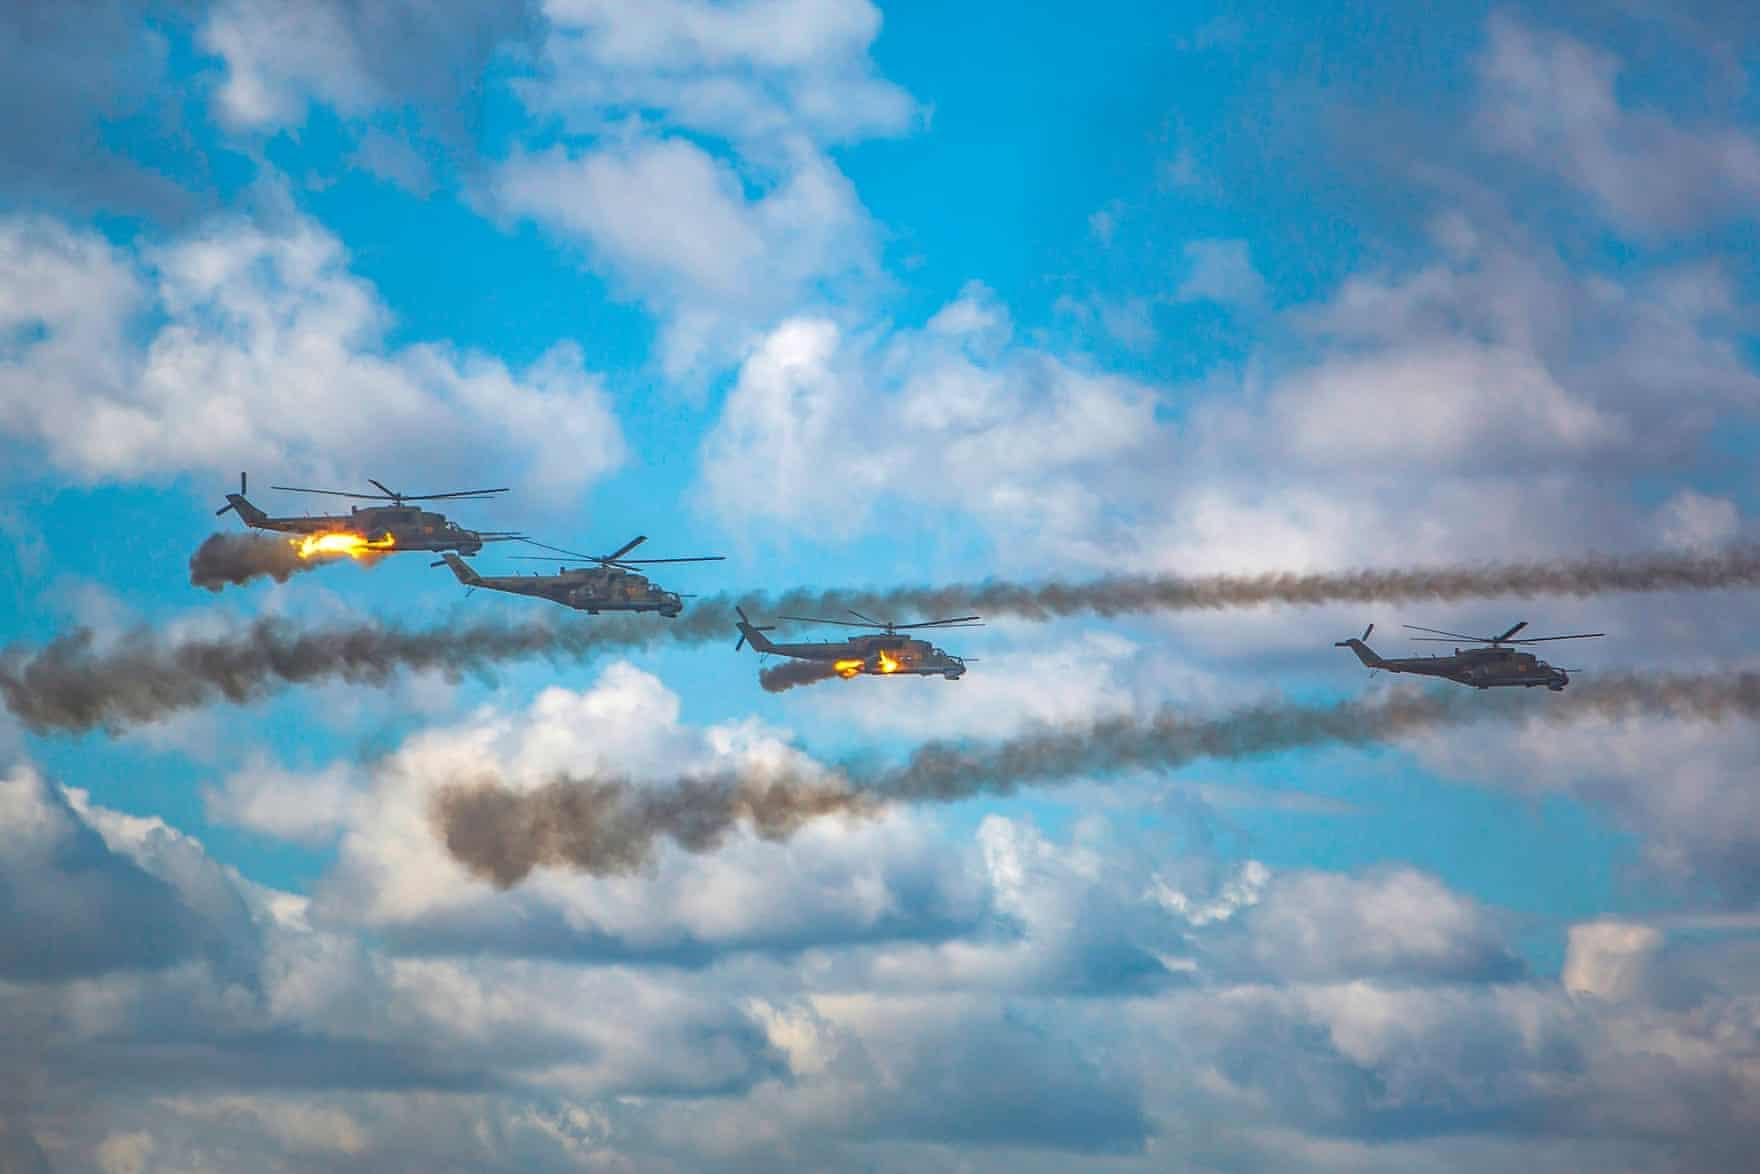 Russian helicopters over Zabaykalsky Krai during Vostok (EPA)